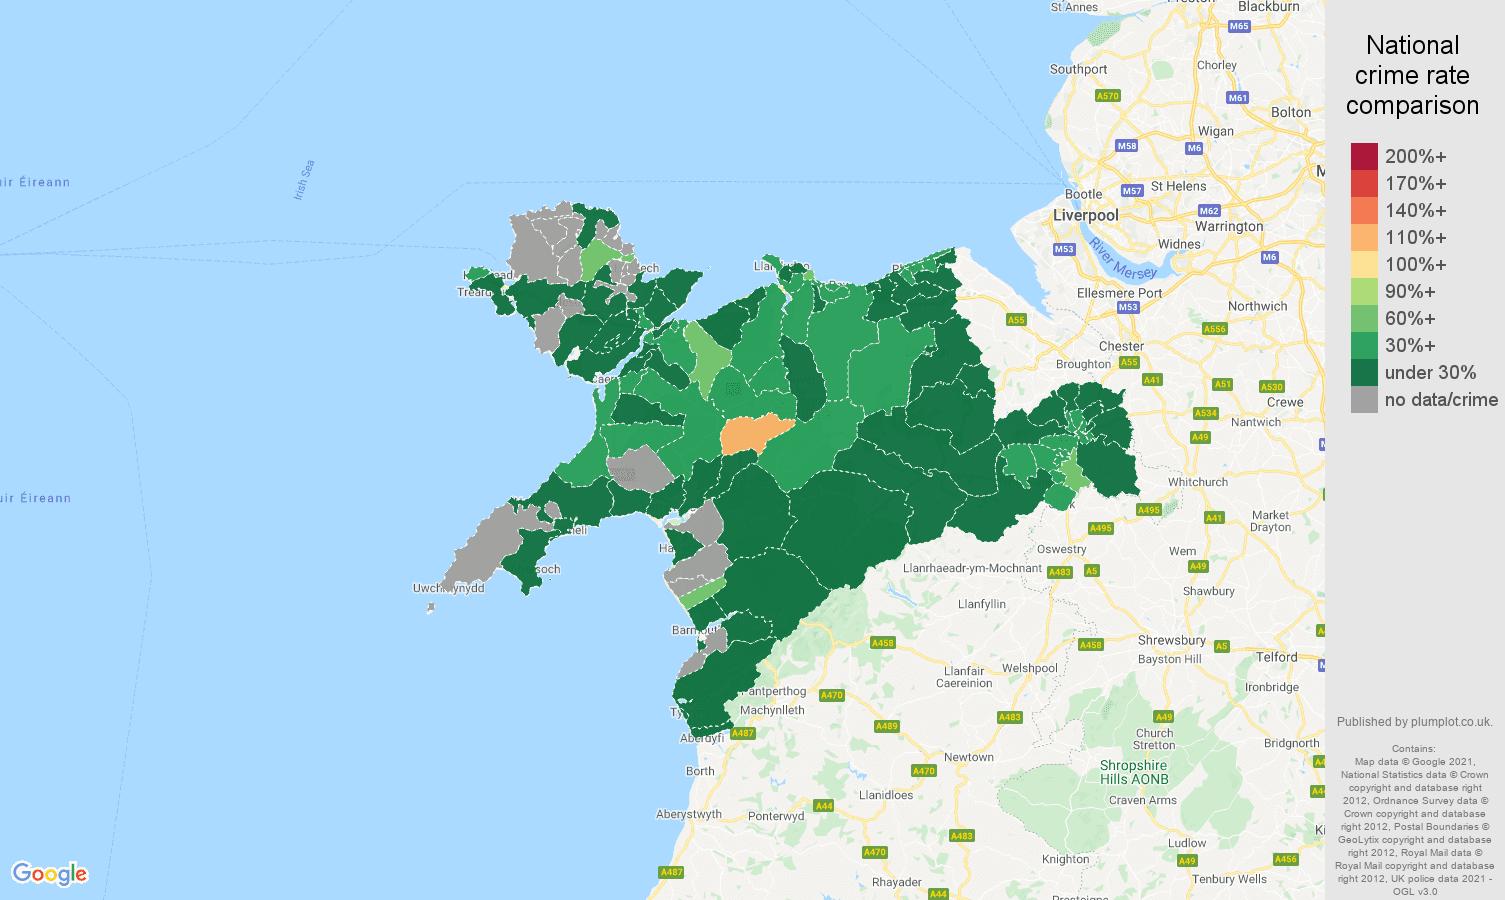 Llandudno vehicle crime rate comparison map